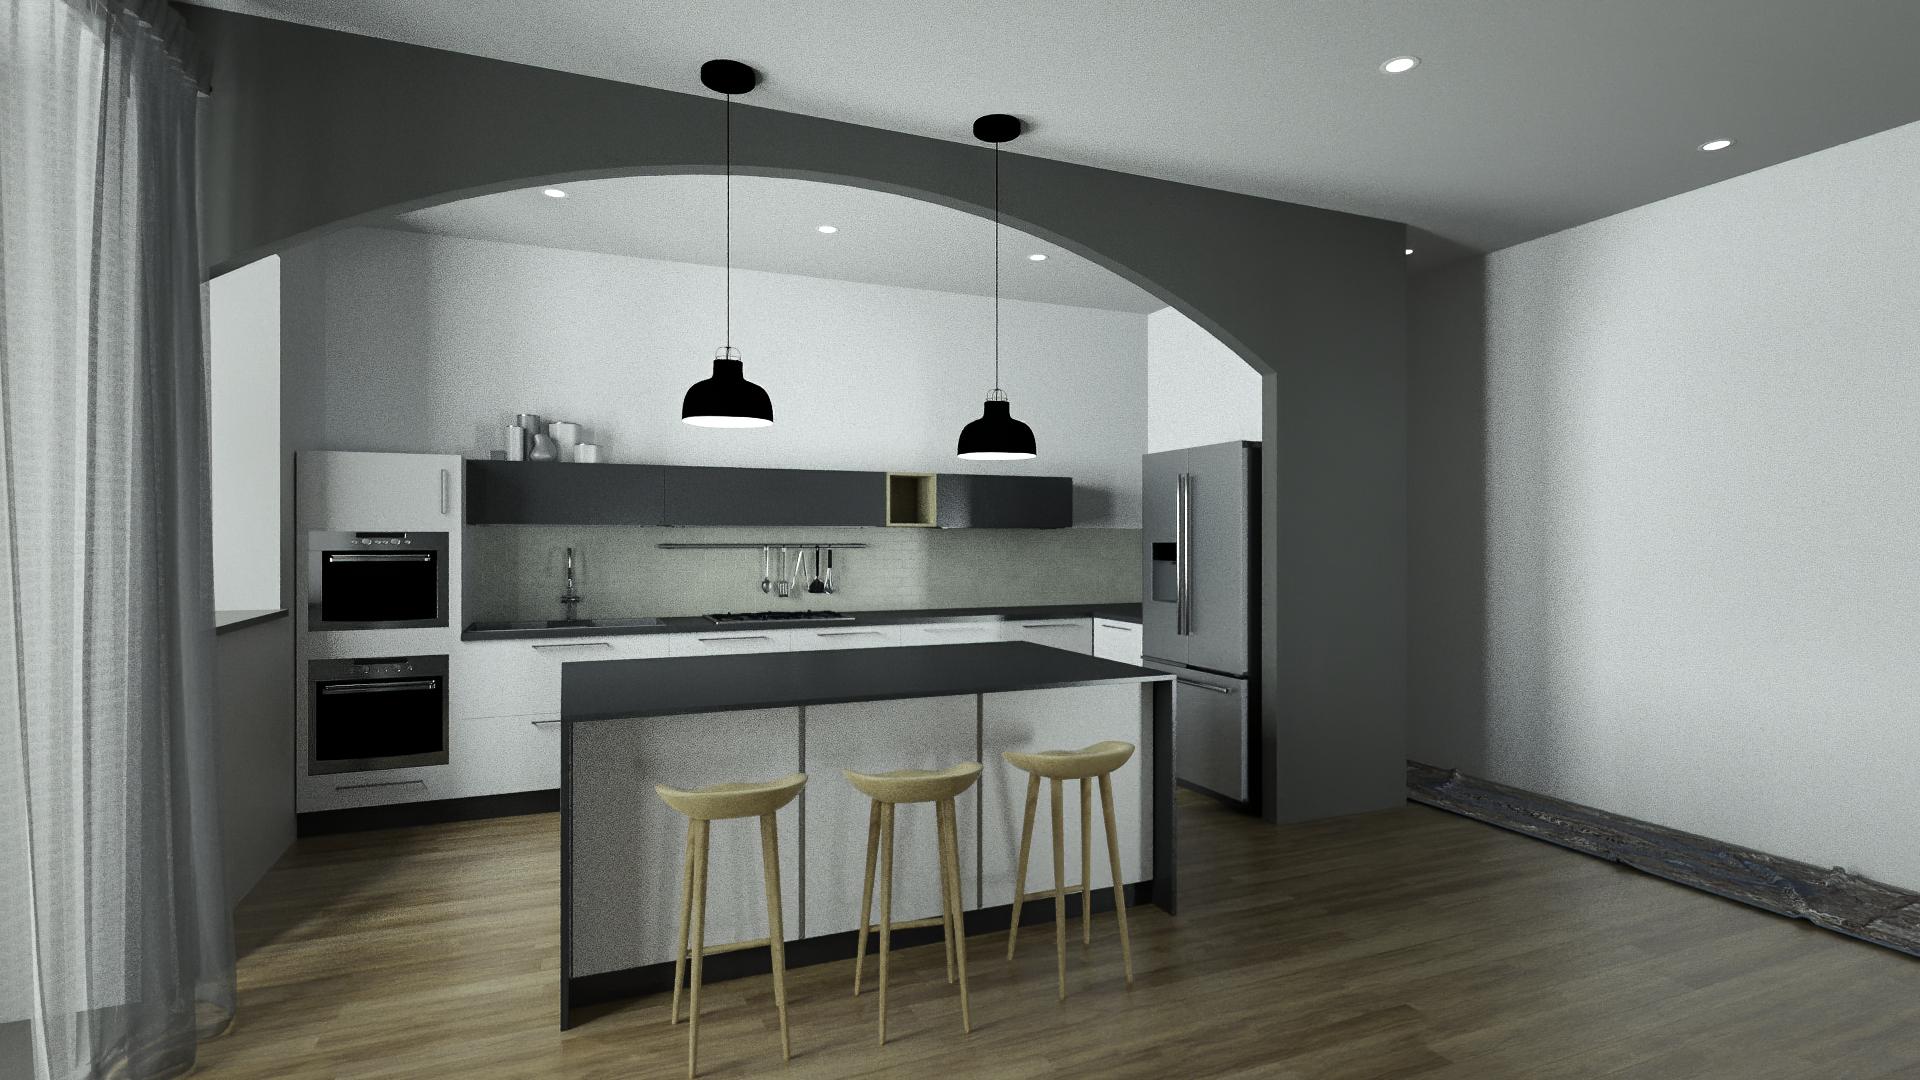 Render 3D Cucina Moderna per Ristruttura